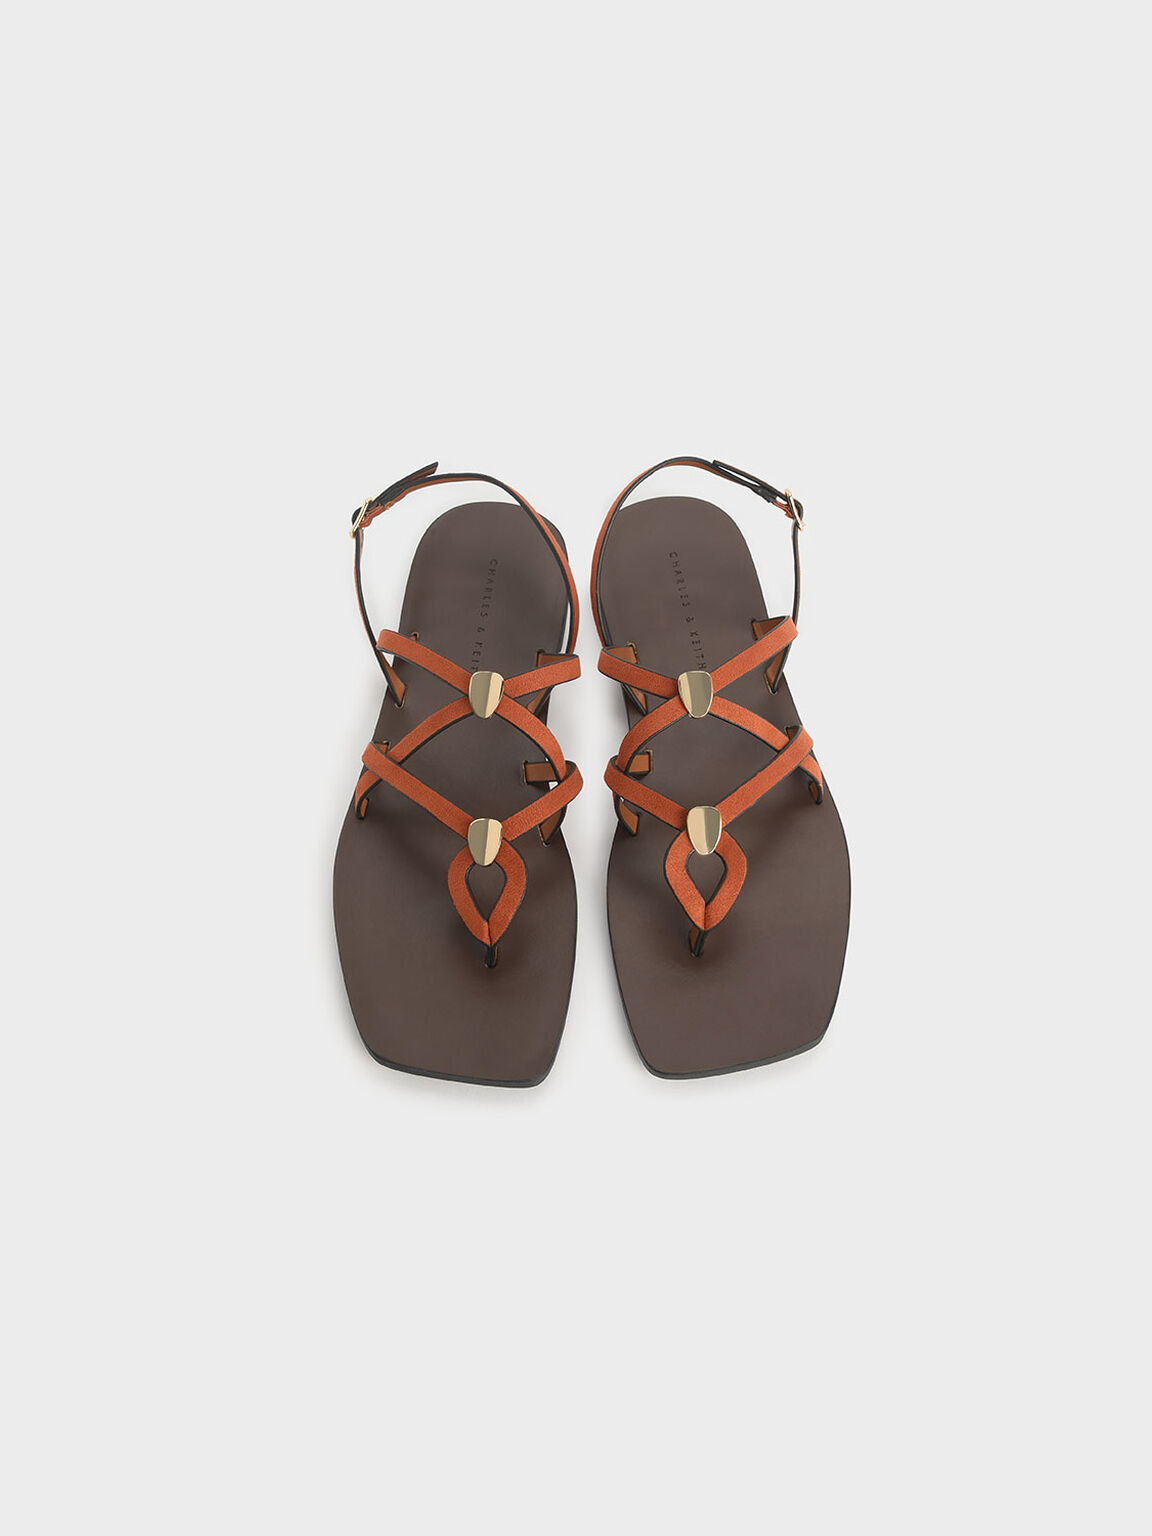 Criss Cross Metal Accent Textured Strappy Sandals, Orange, hi-res